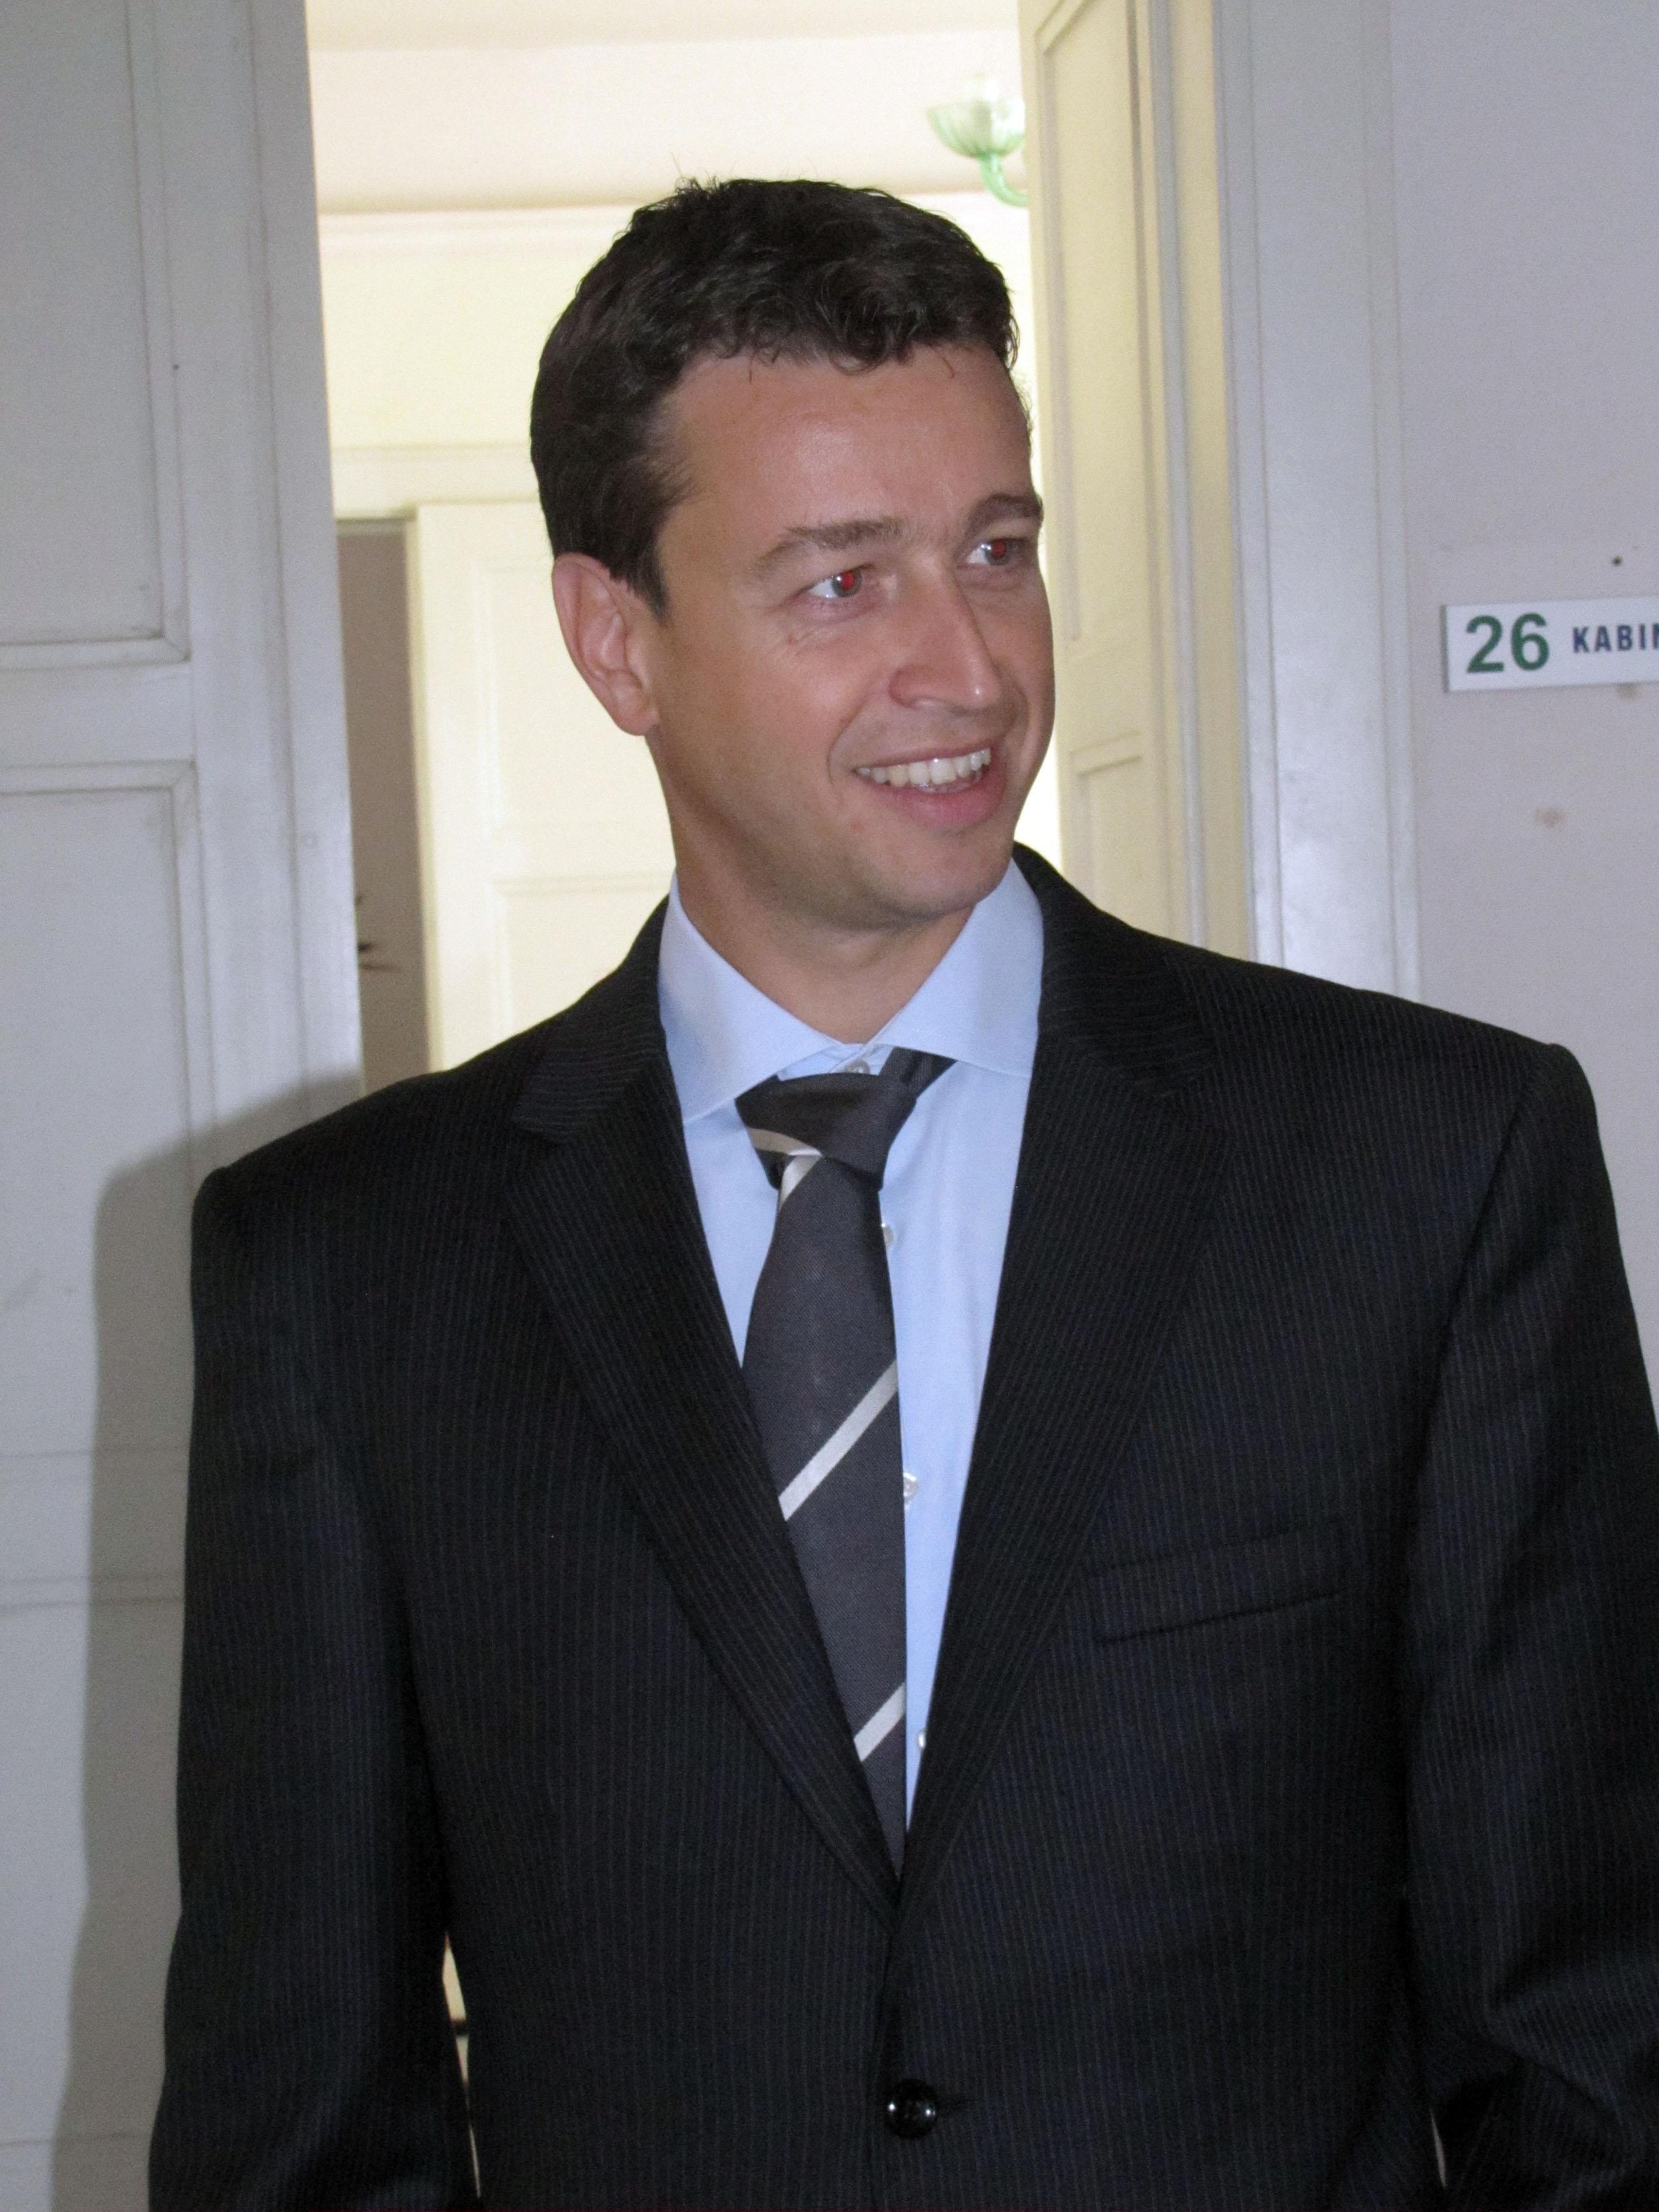 Balazs Bekeffy, predsjednik Uprave OTP banke